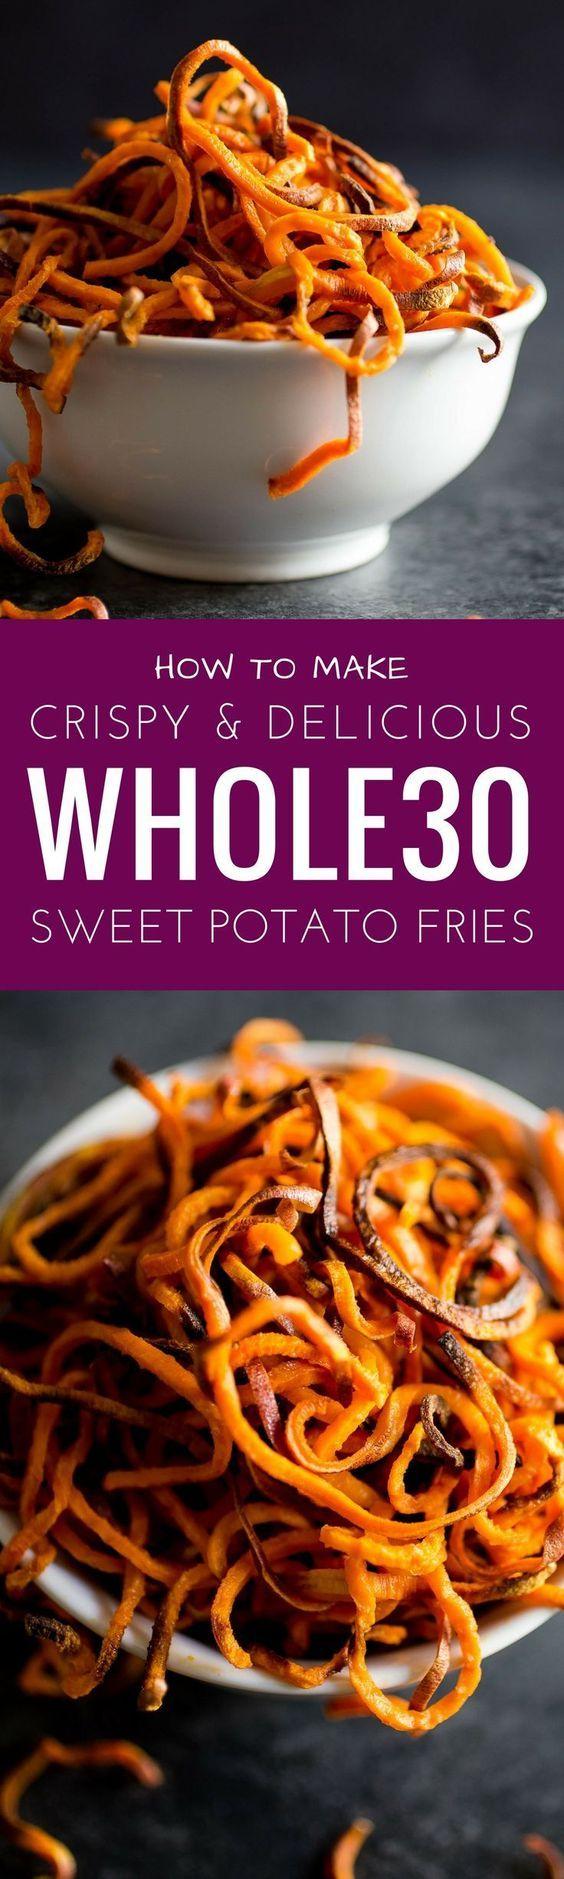 Best Paleo Sweet potato fries. Spiralized sweet potato fries. Paleo sweet potato recipes. Easy spiralized recipes. Vegan spiralized sweet potato. Vegan sweet potato recipe. via @themovementmenu